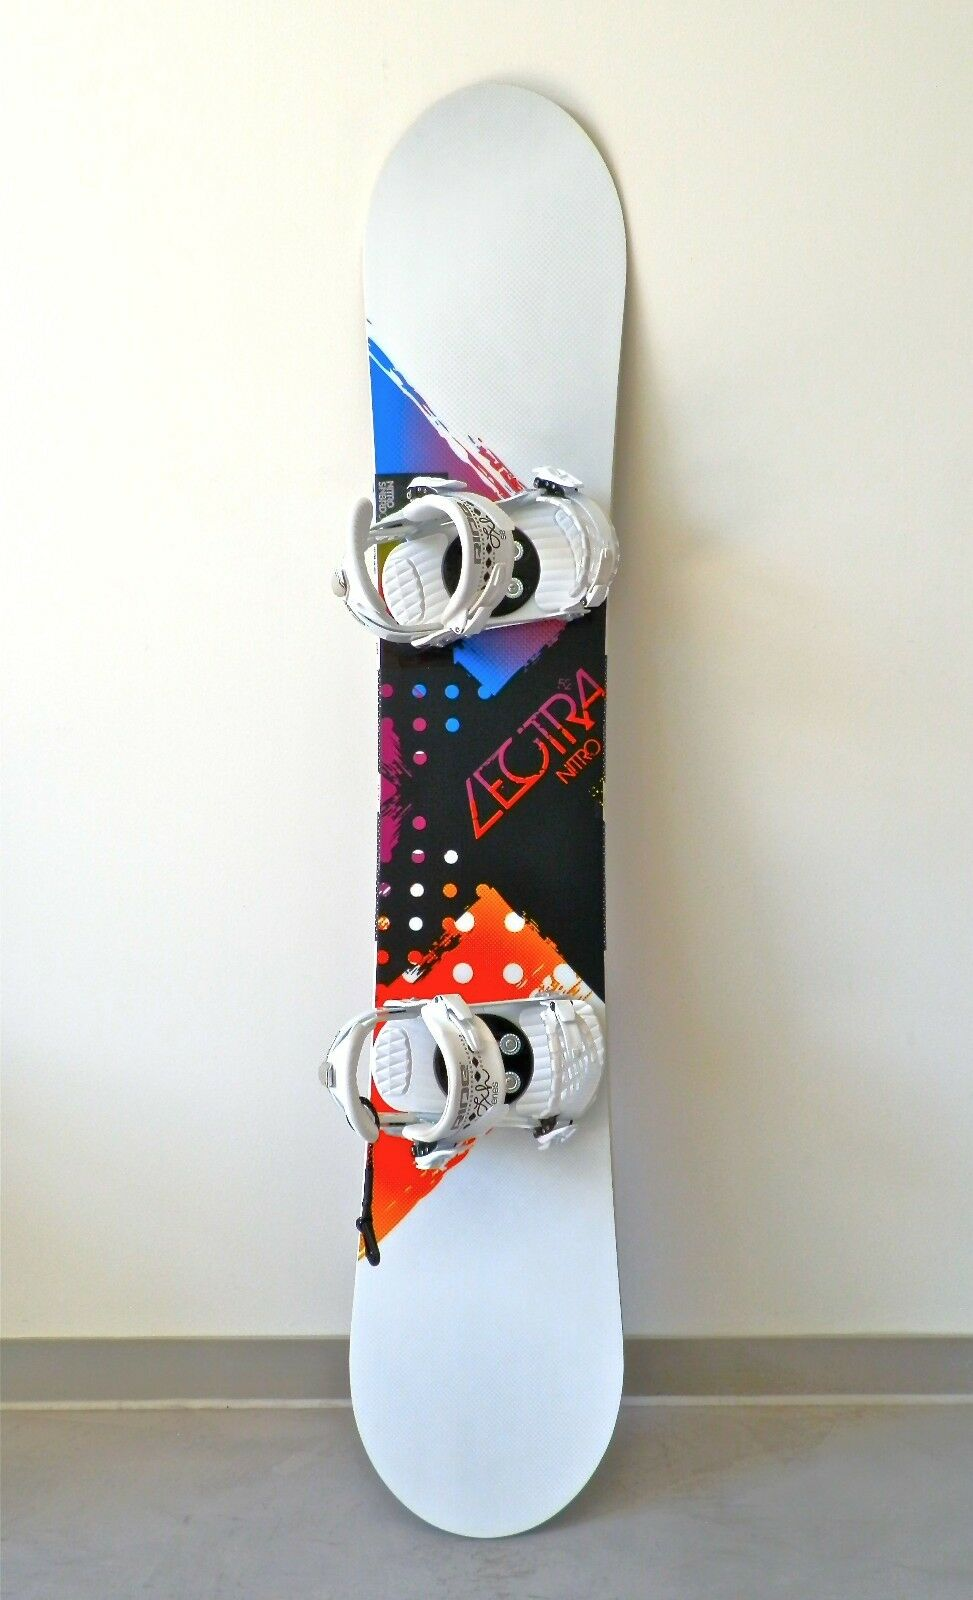 Nitro Snowboard Women's Lectra colorband Zero 152 cm Ride Lxh Bindings (52) 2012